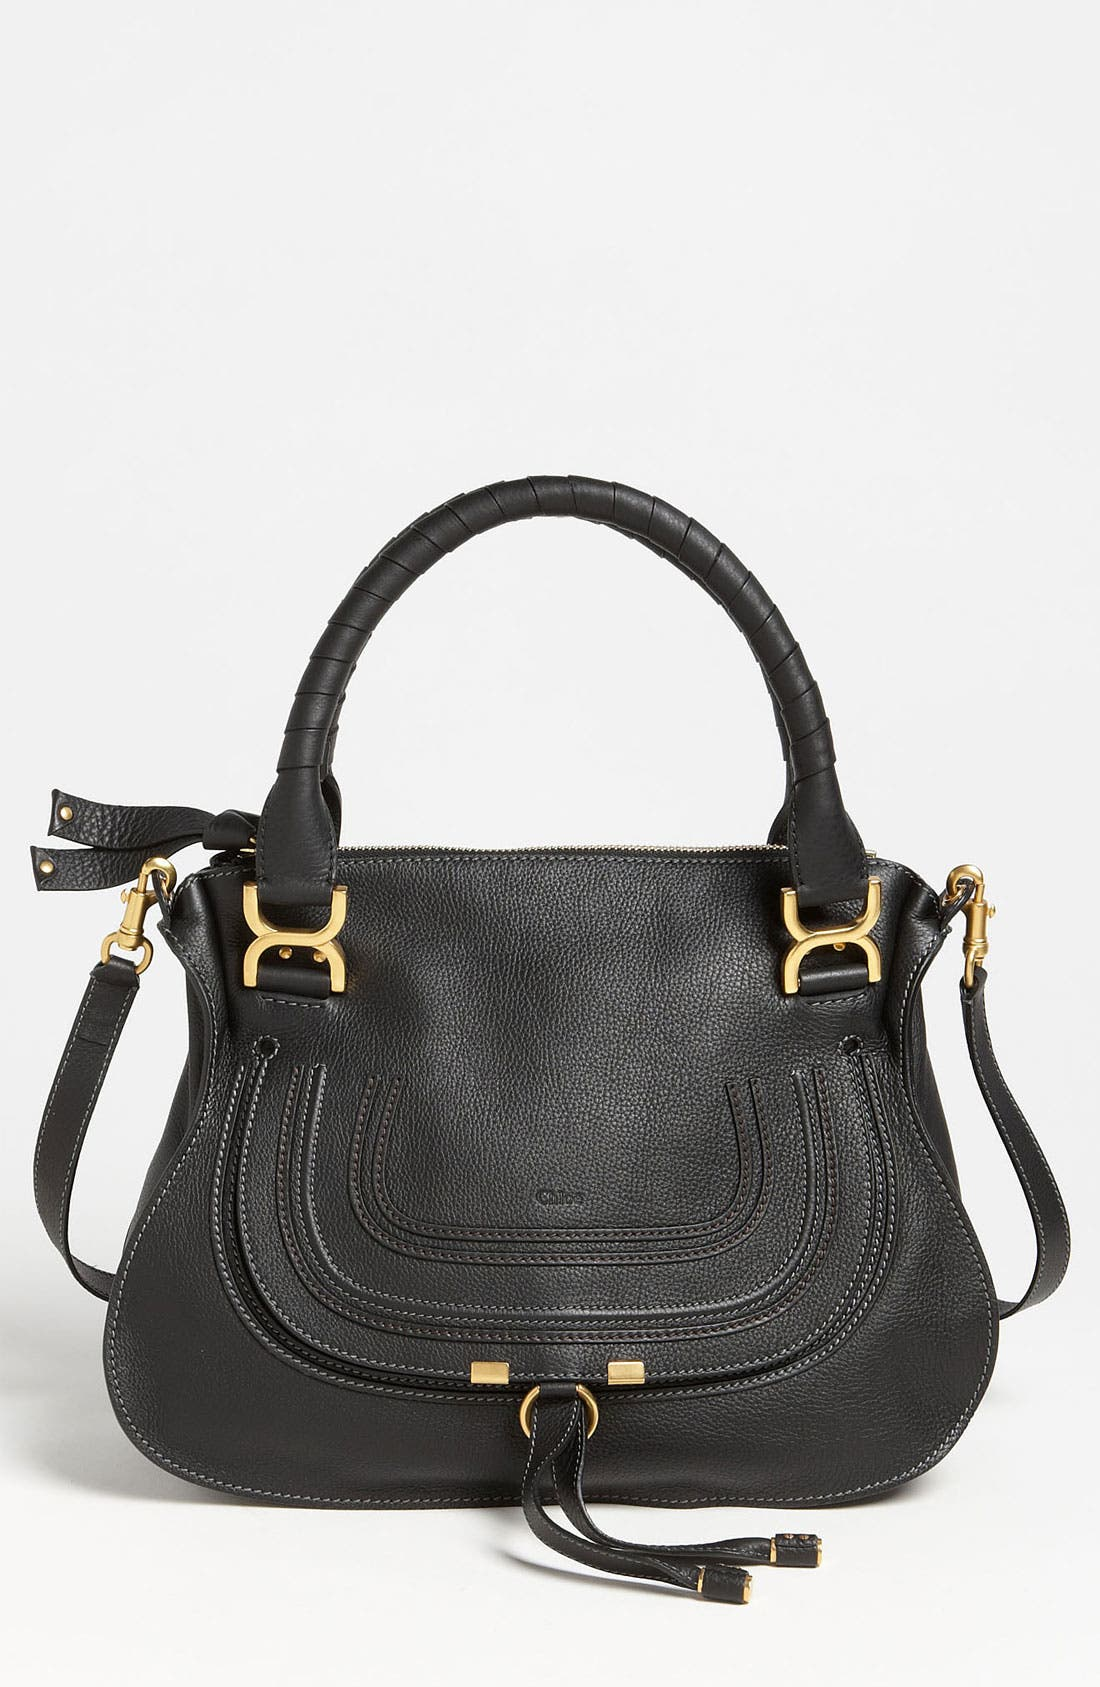 Chloé Medium Marcie Calfskin Leather Satchel | Nordstrom